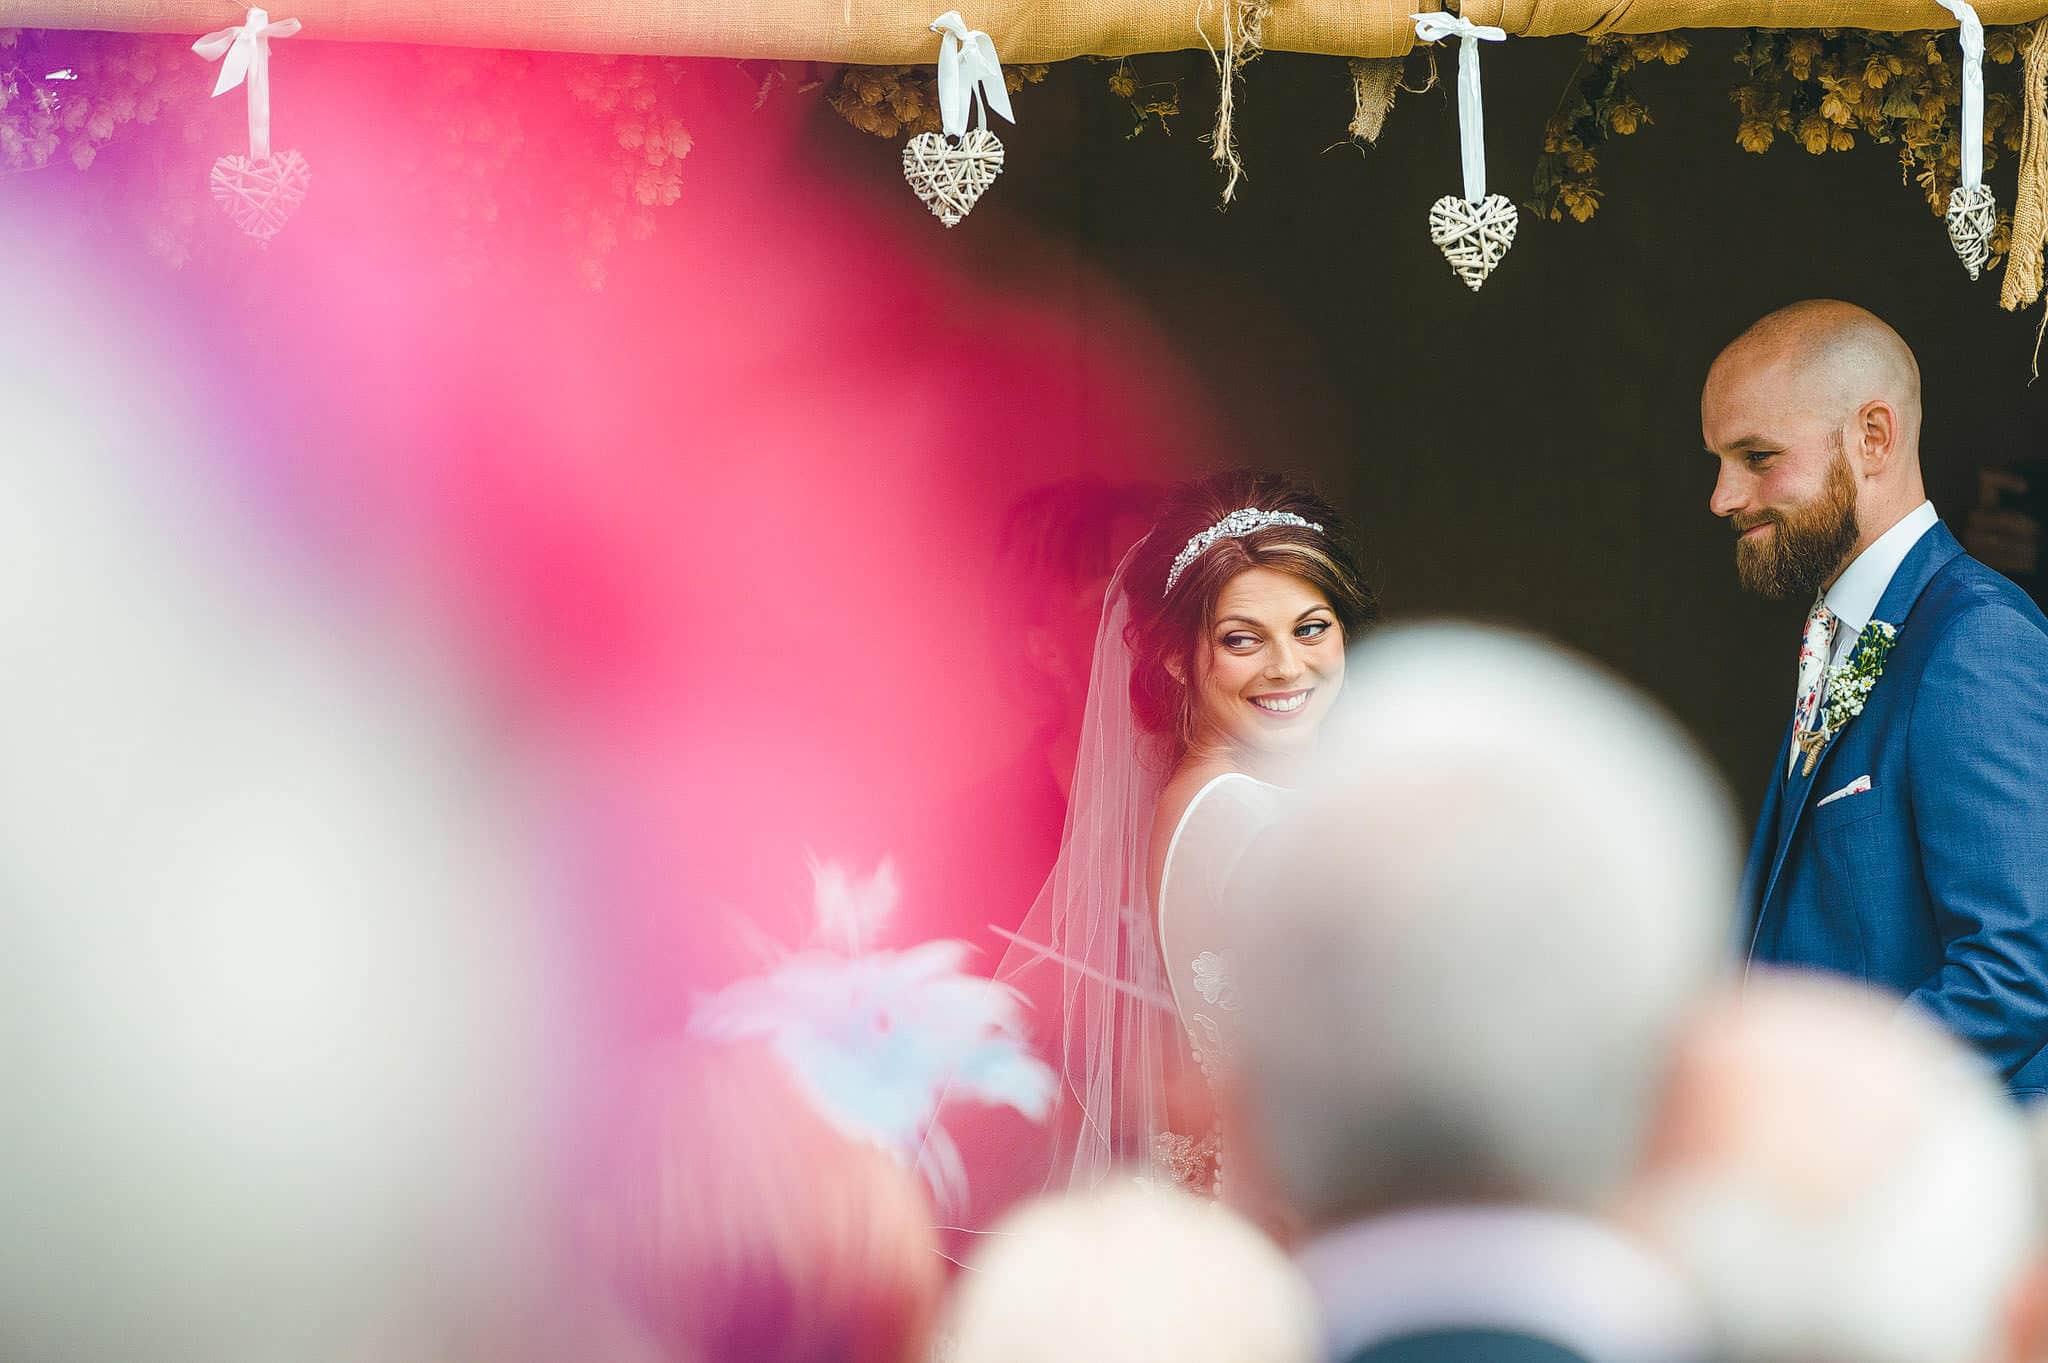 wedding photography midlands 24 - Midlands wedding photography - 2015 Review